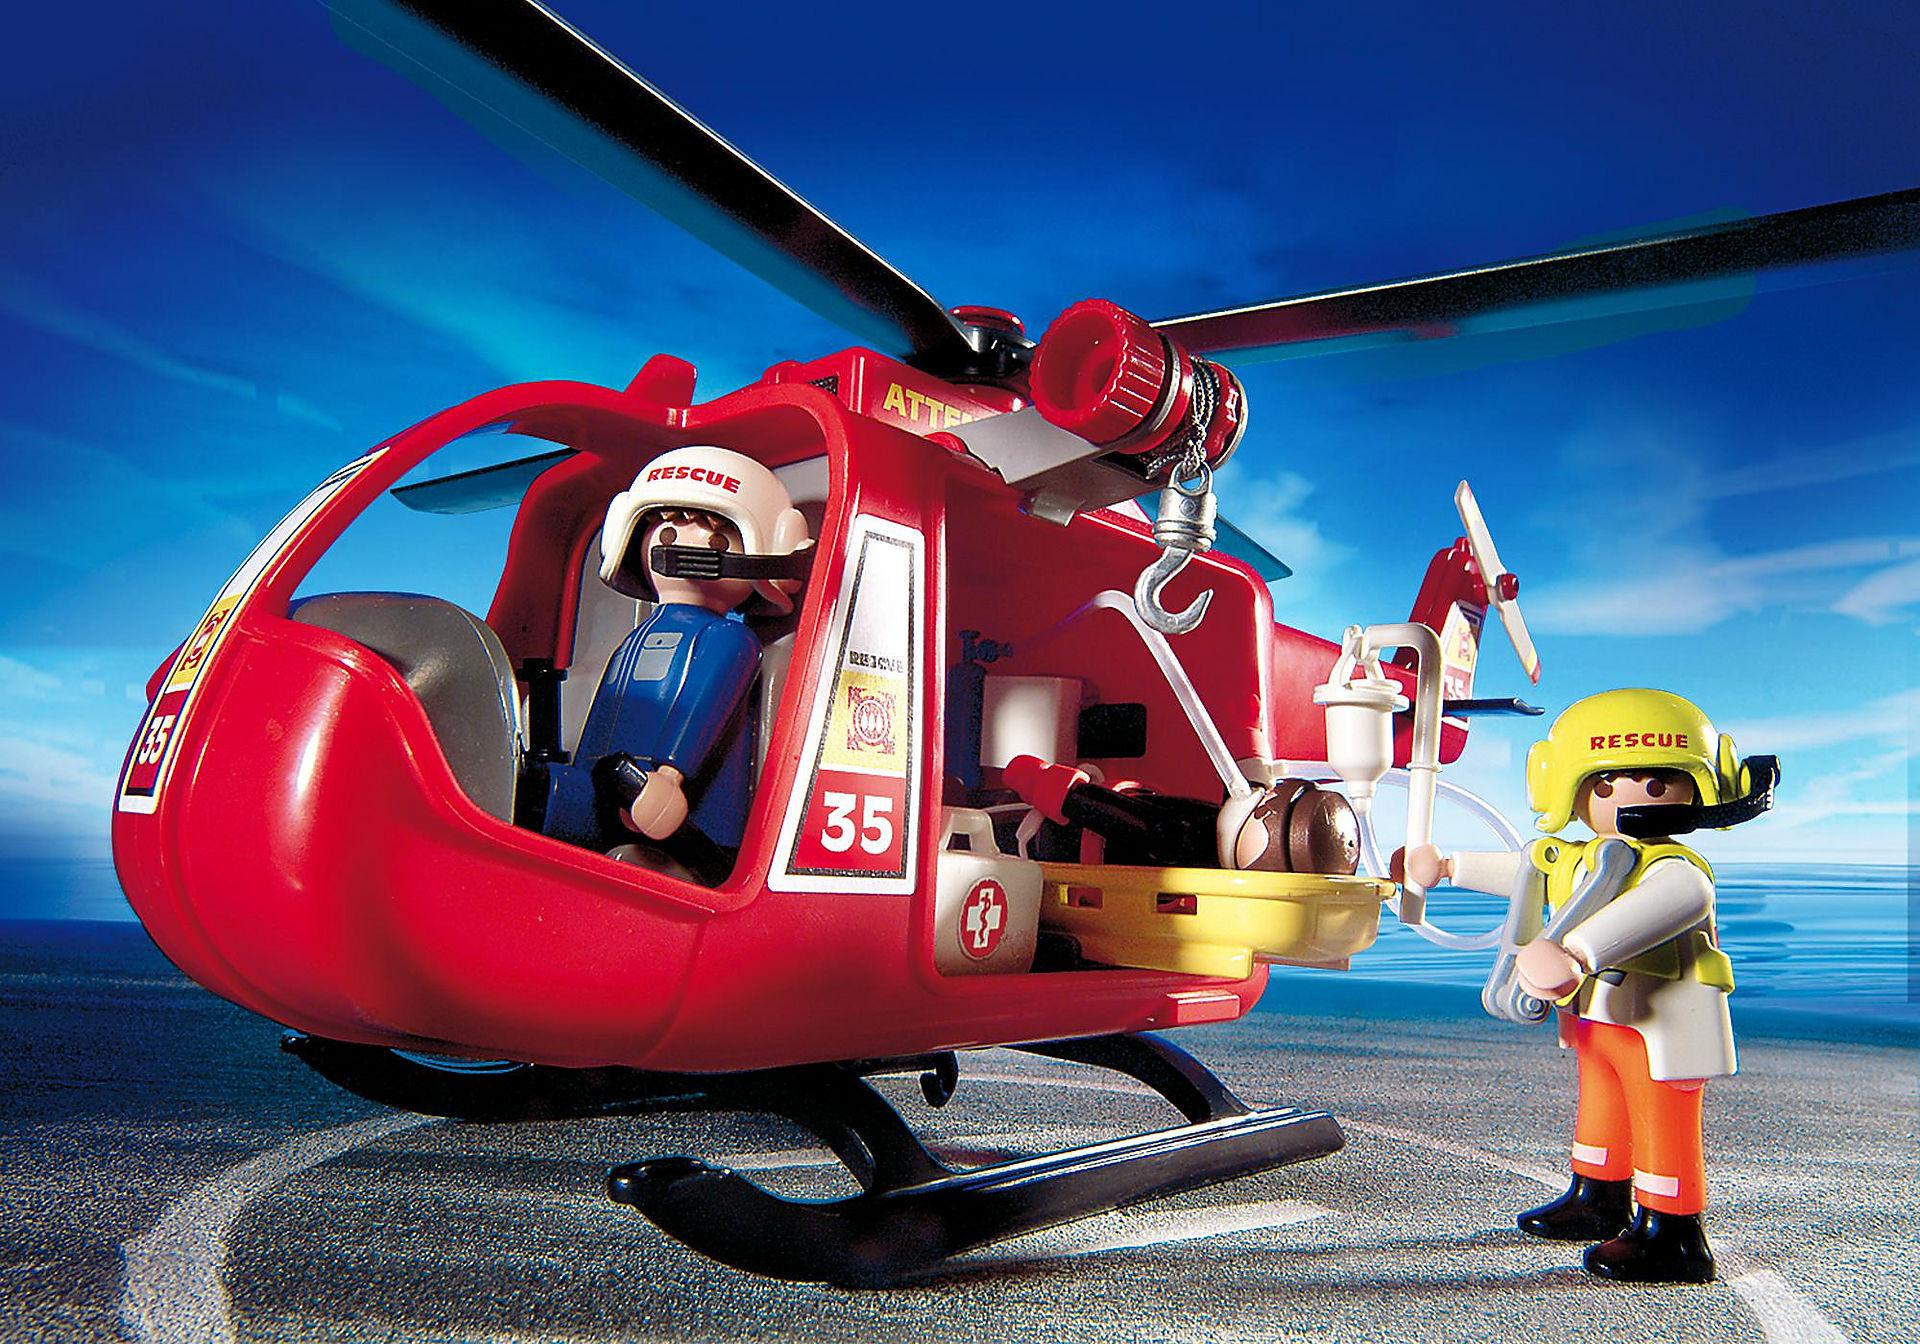 http://media.playmobil.com/i/playmobil/4428_product_extra2/SOS-Helikopter/Rettungsboot